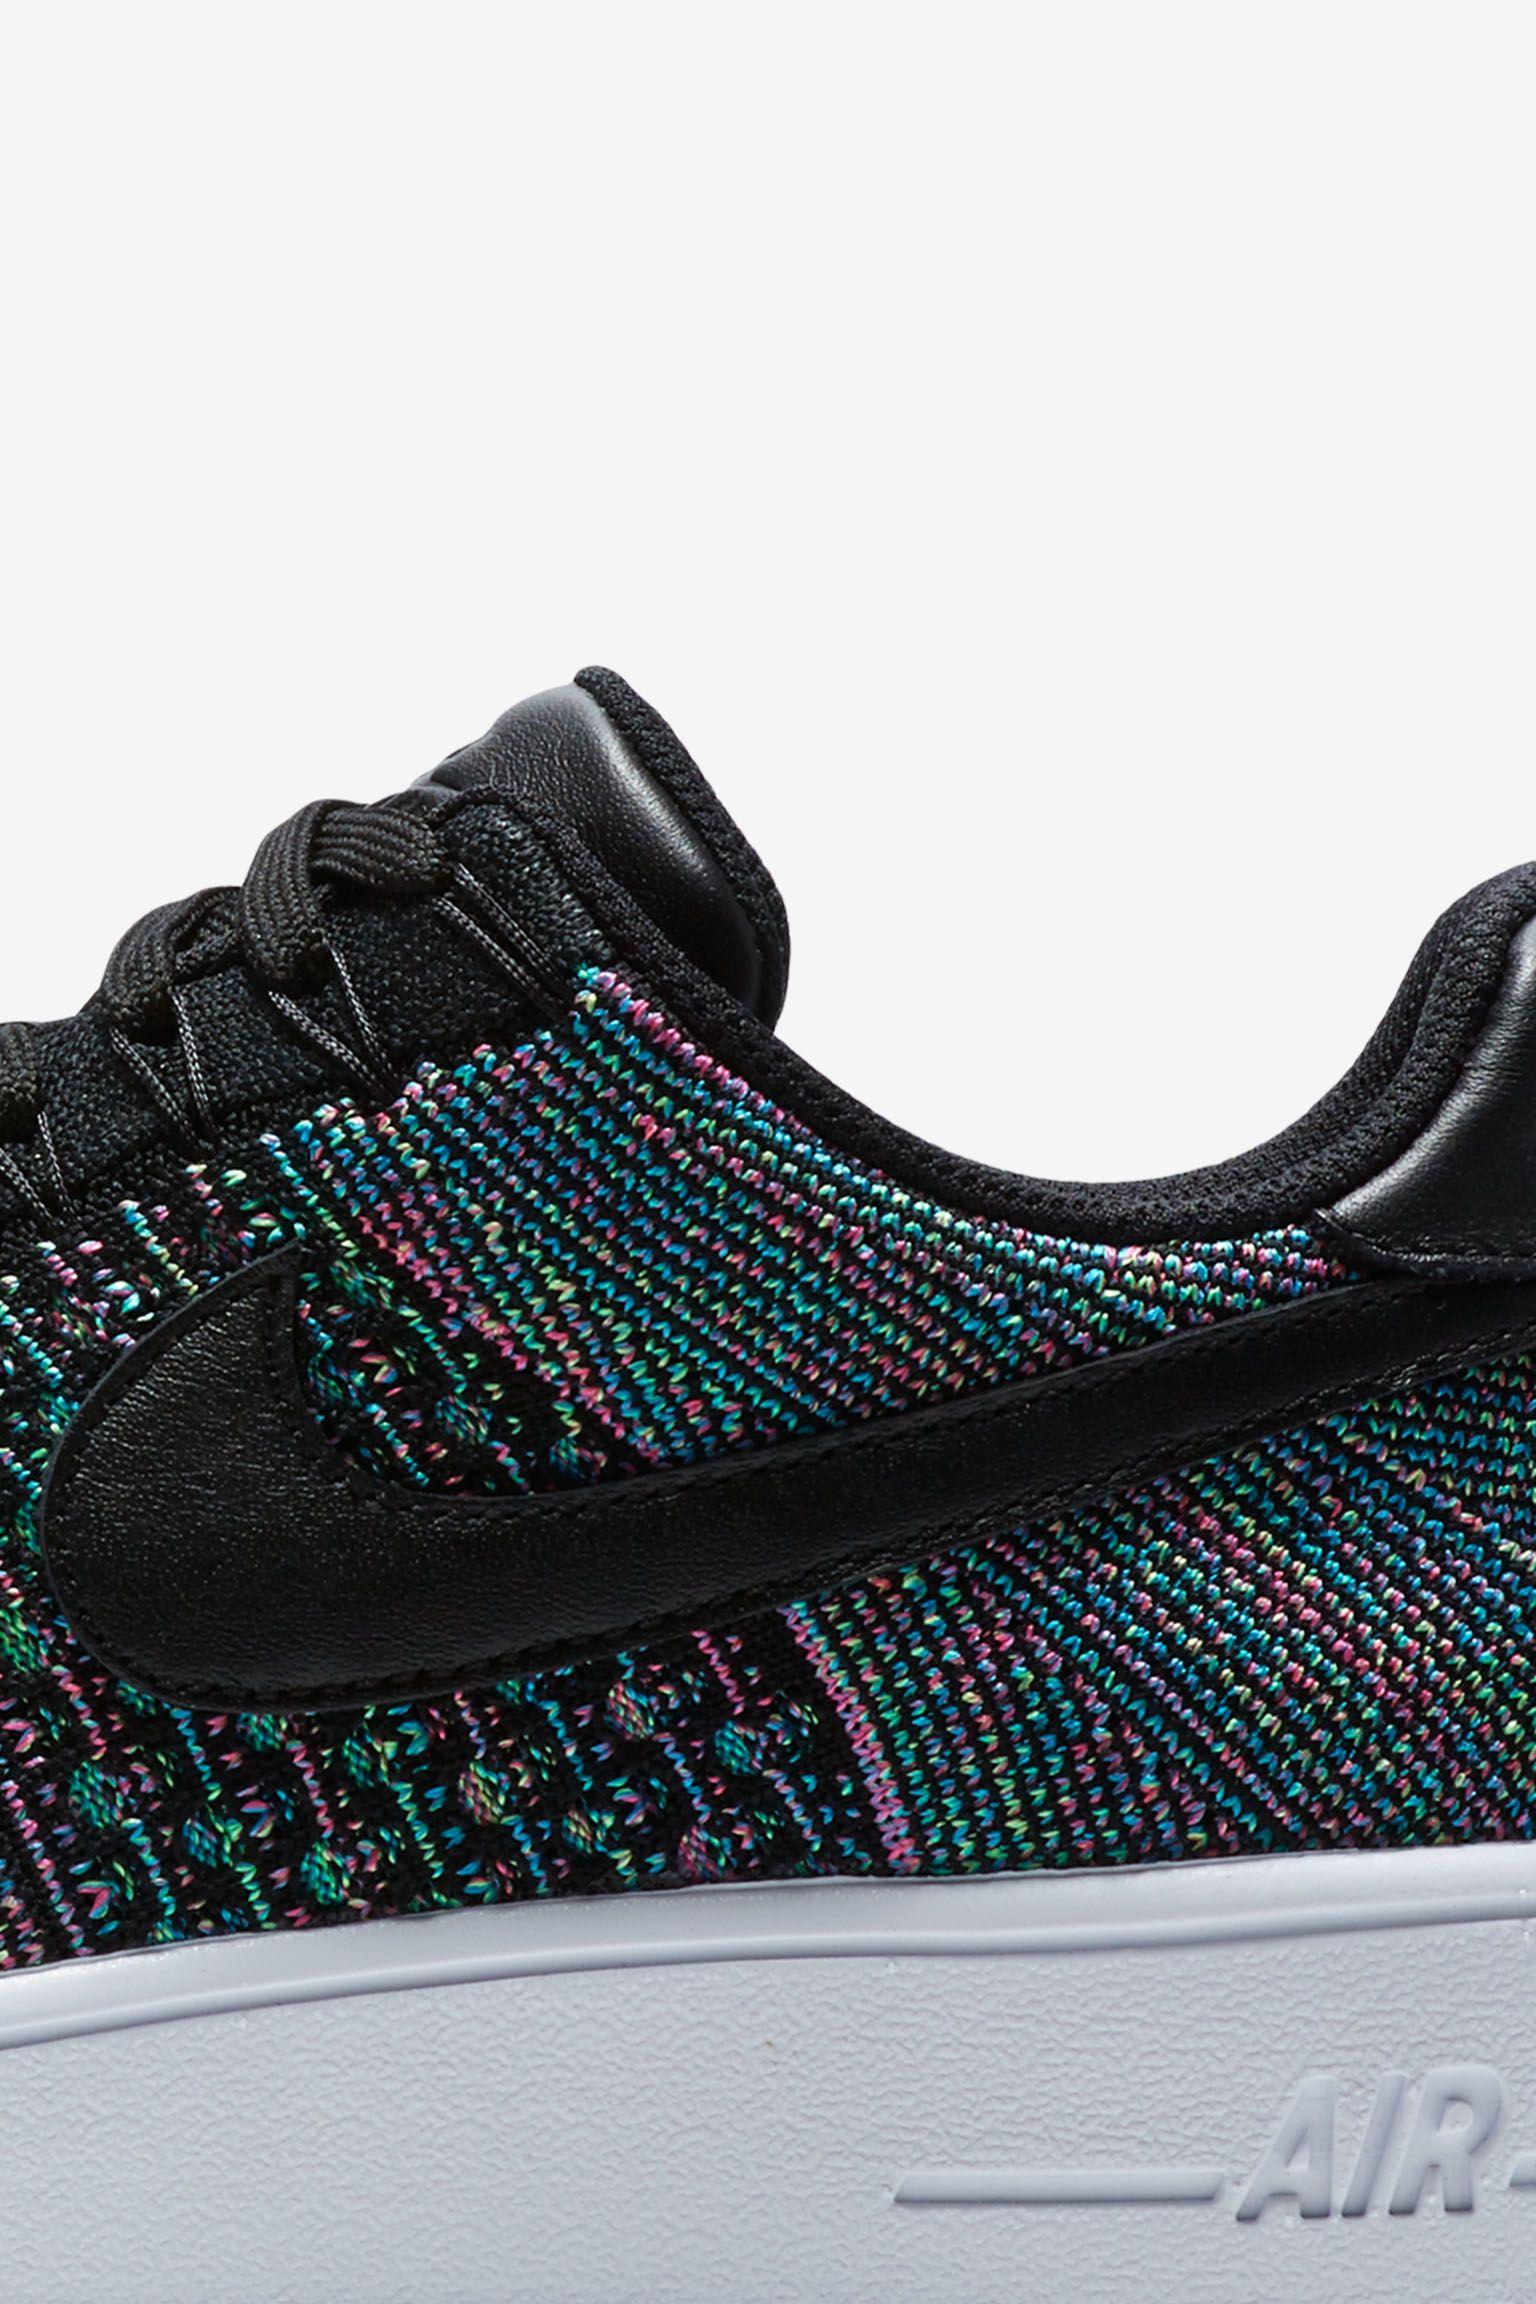 Nike Air Force 1 Ultra Flyknit Low 'Multicolor' Release Date